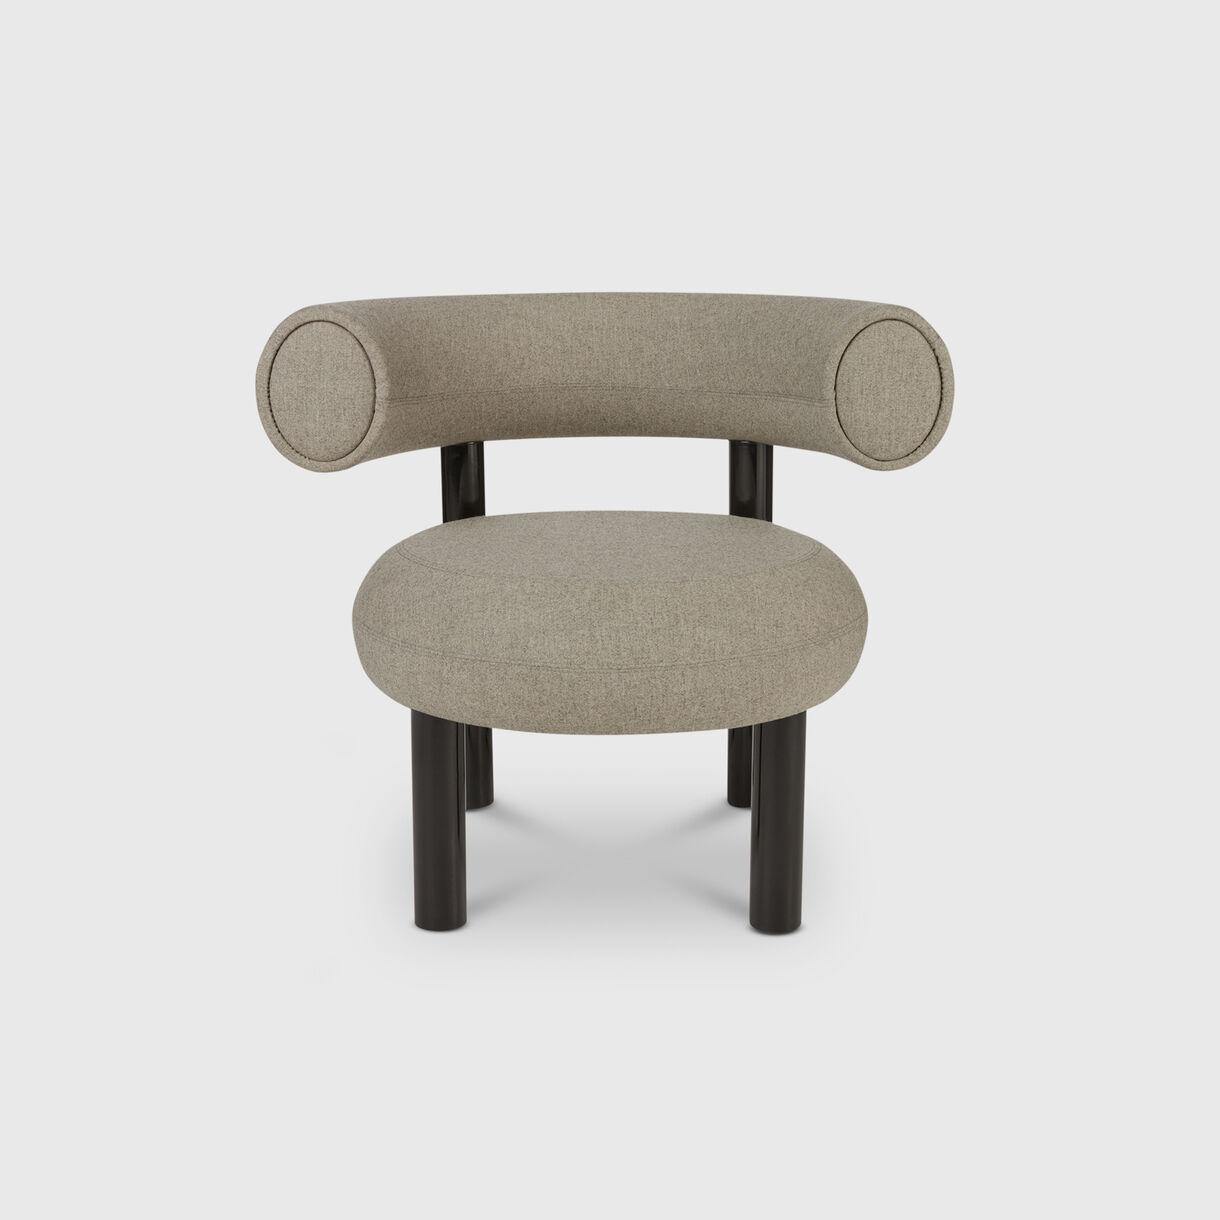 Fat Lounge Chair, Kvadrat